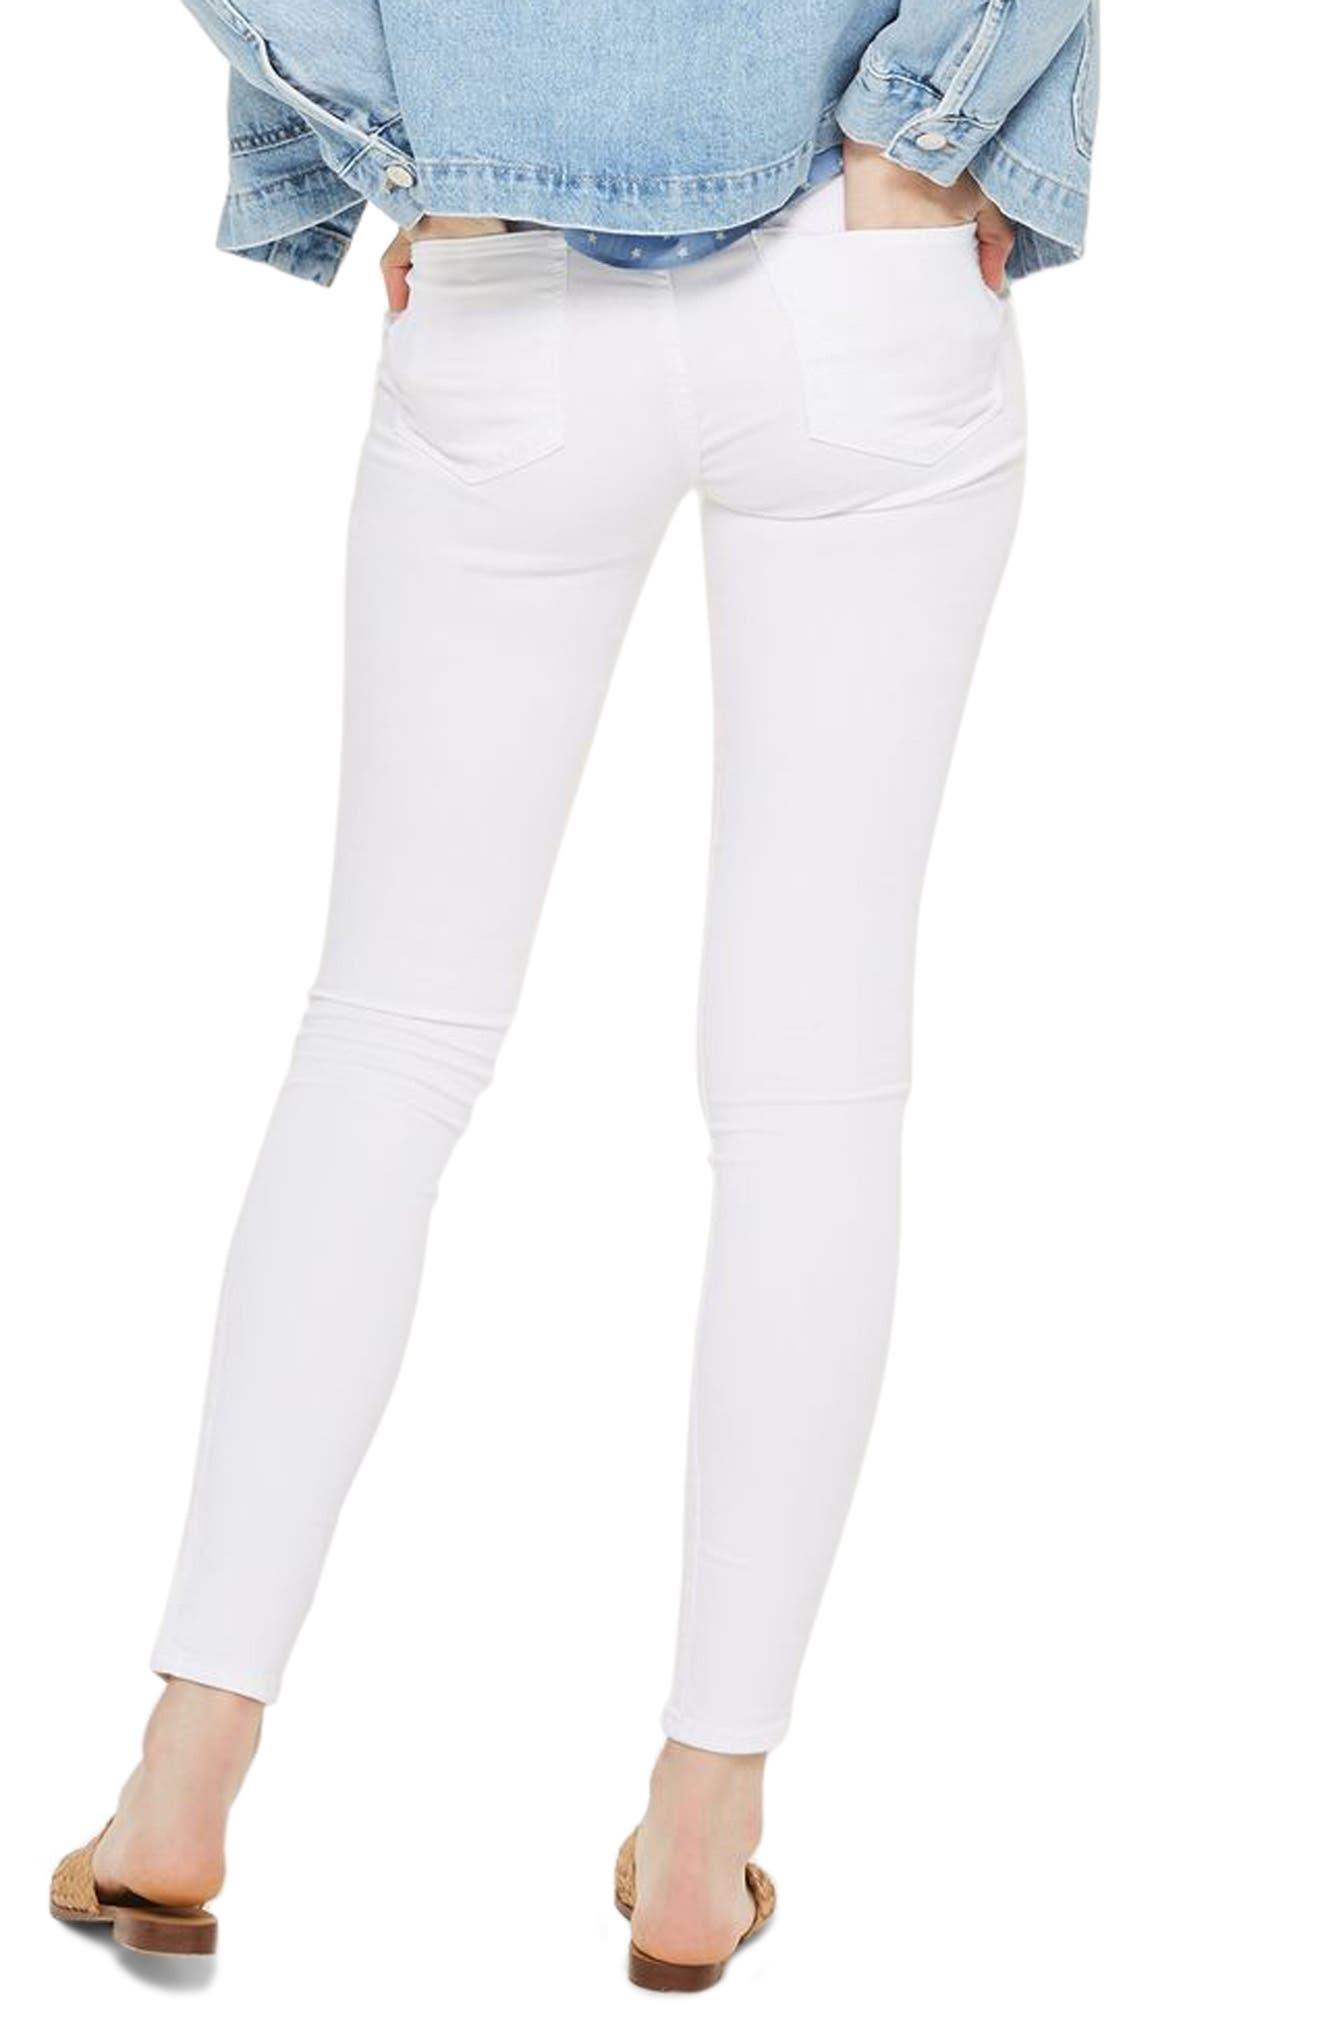 Leigh Skinny Jeans,                             Alternate thumbnail 2, color,                             White